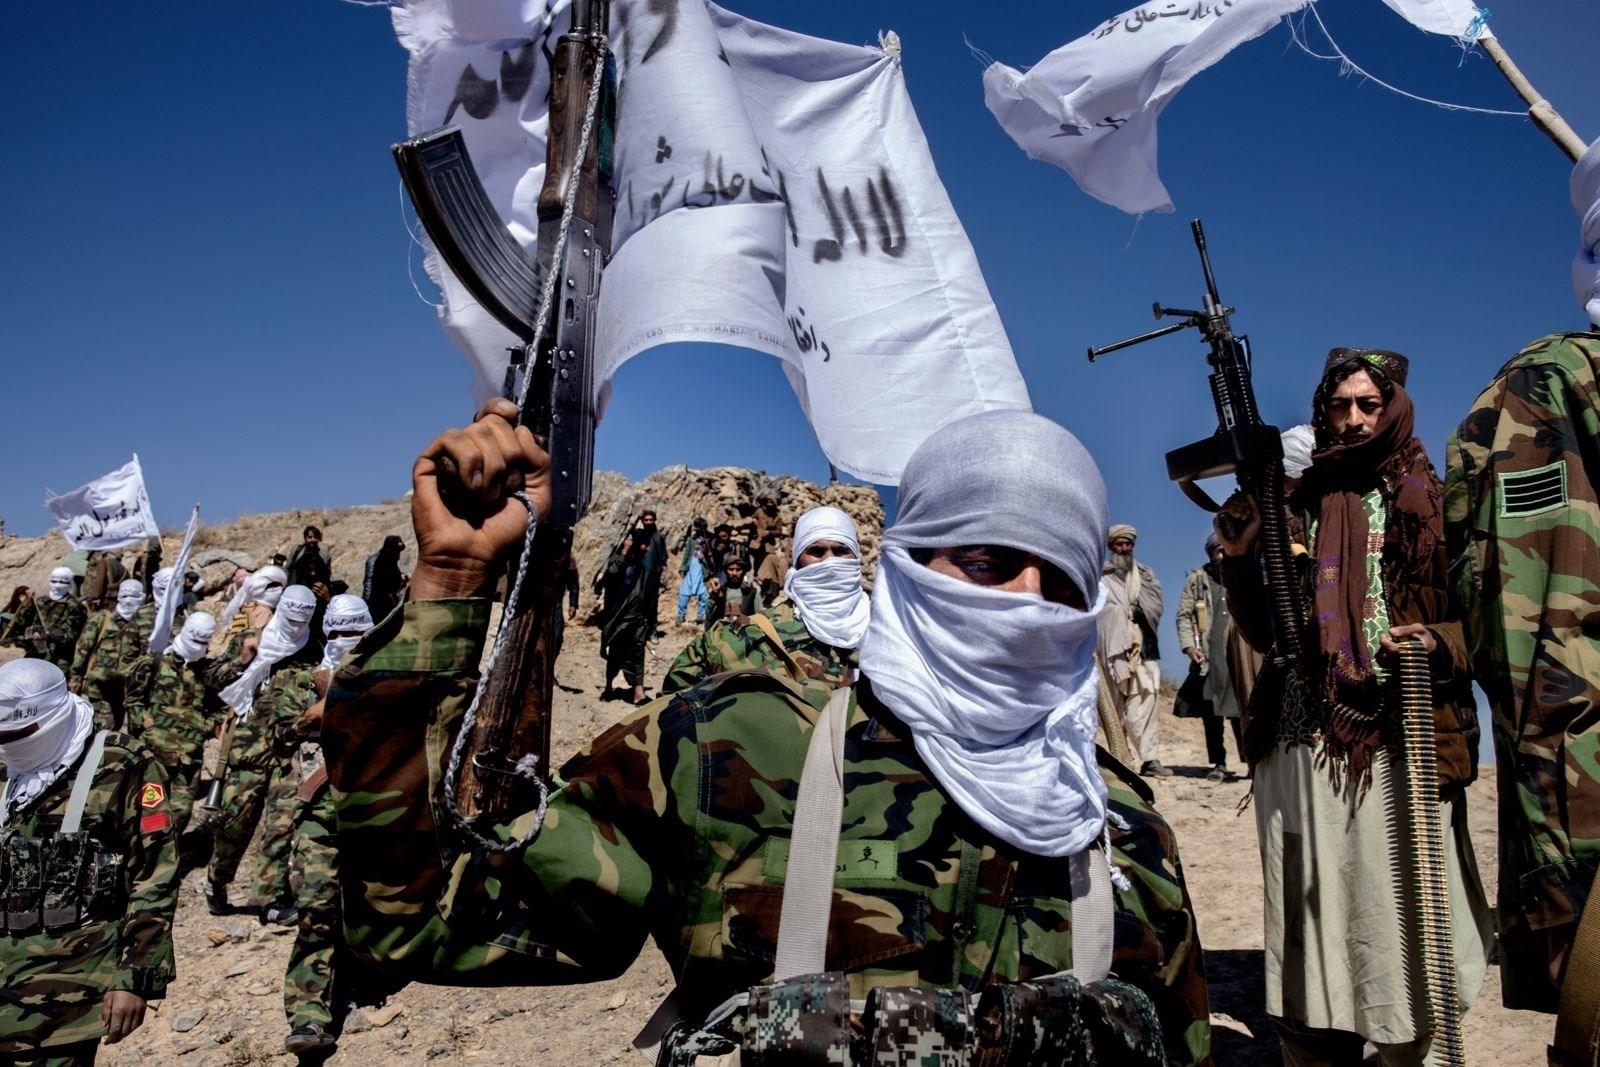 Taliban militants in Afghanistan